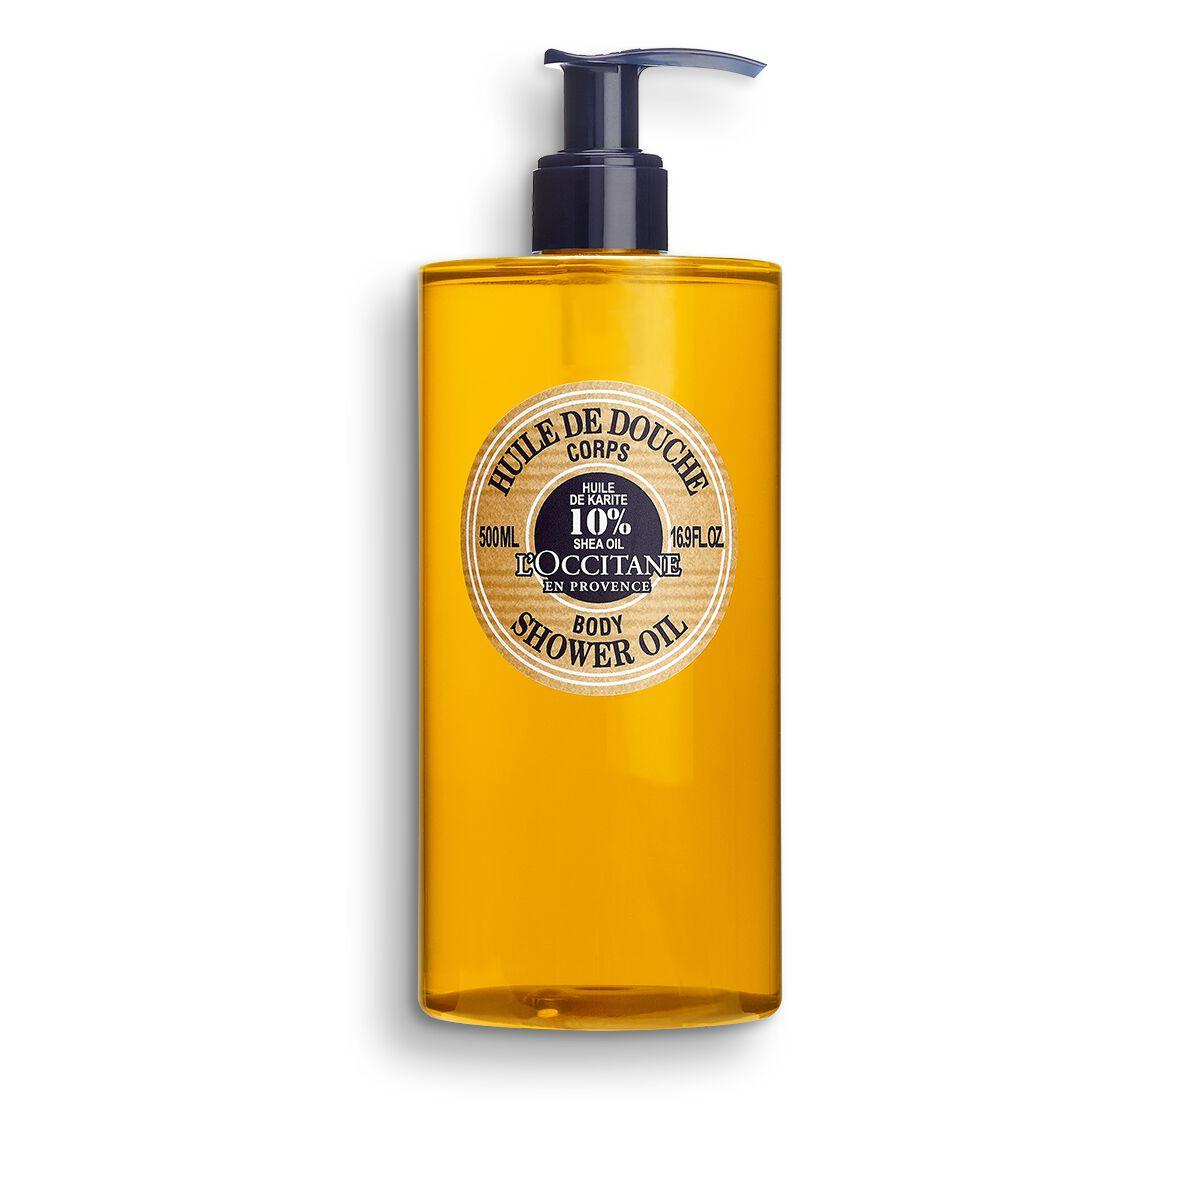 Shea Body Shower Oil 16.9 fl. oz.